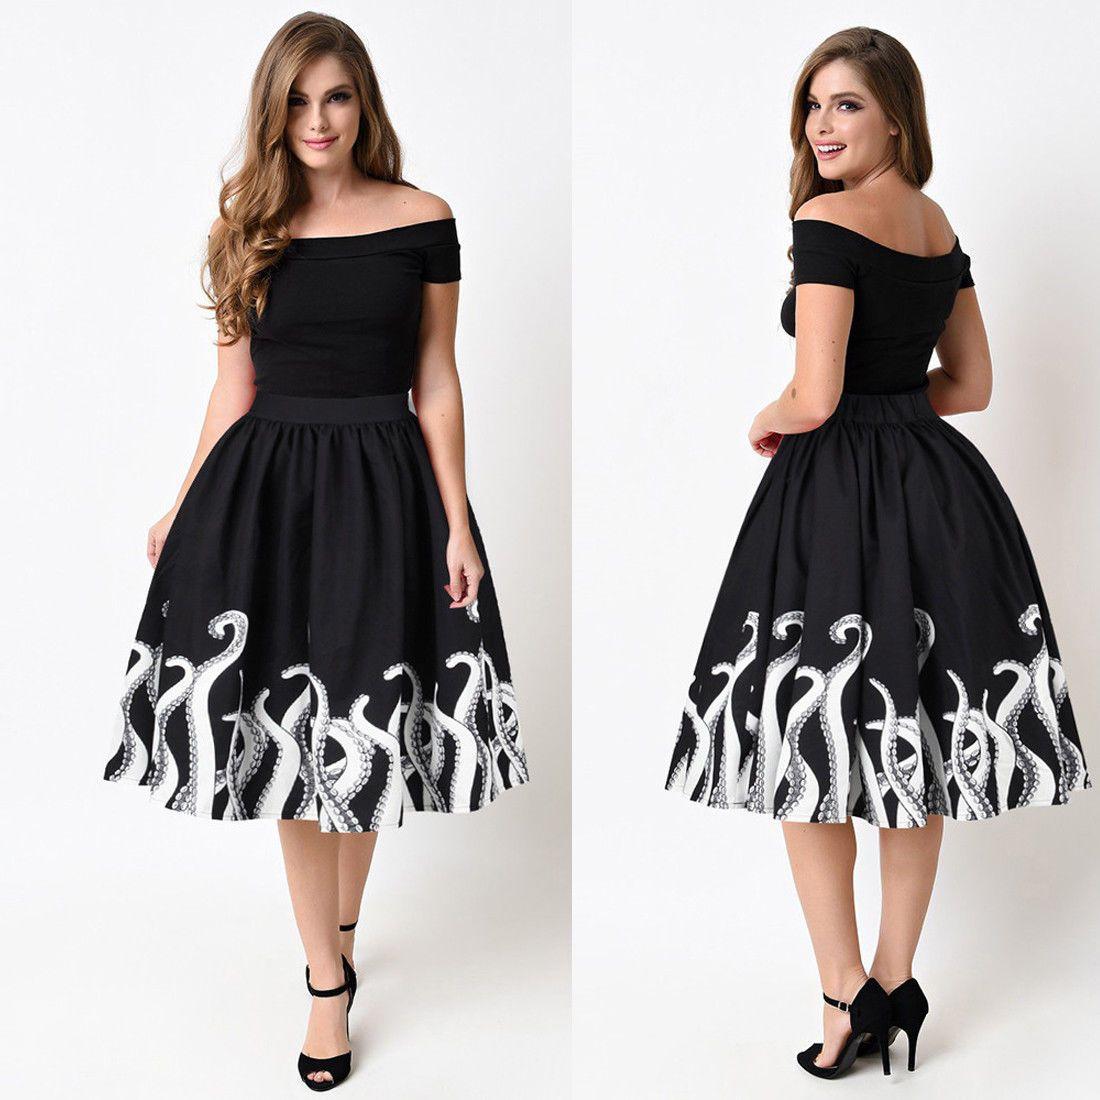 12.55 - Fashion Women s Octopus Squid Fancy Print Pattern Mini Knee Length  Skater Skirt  ebay  Fashion fe284dc5a